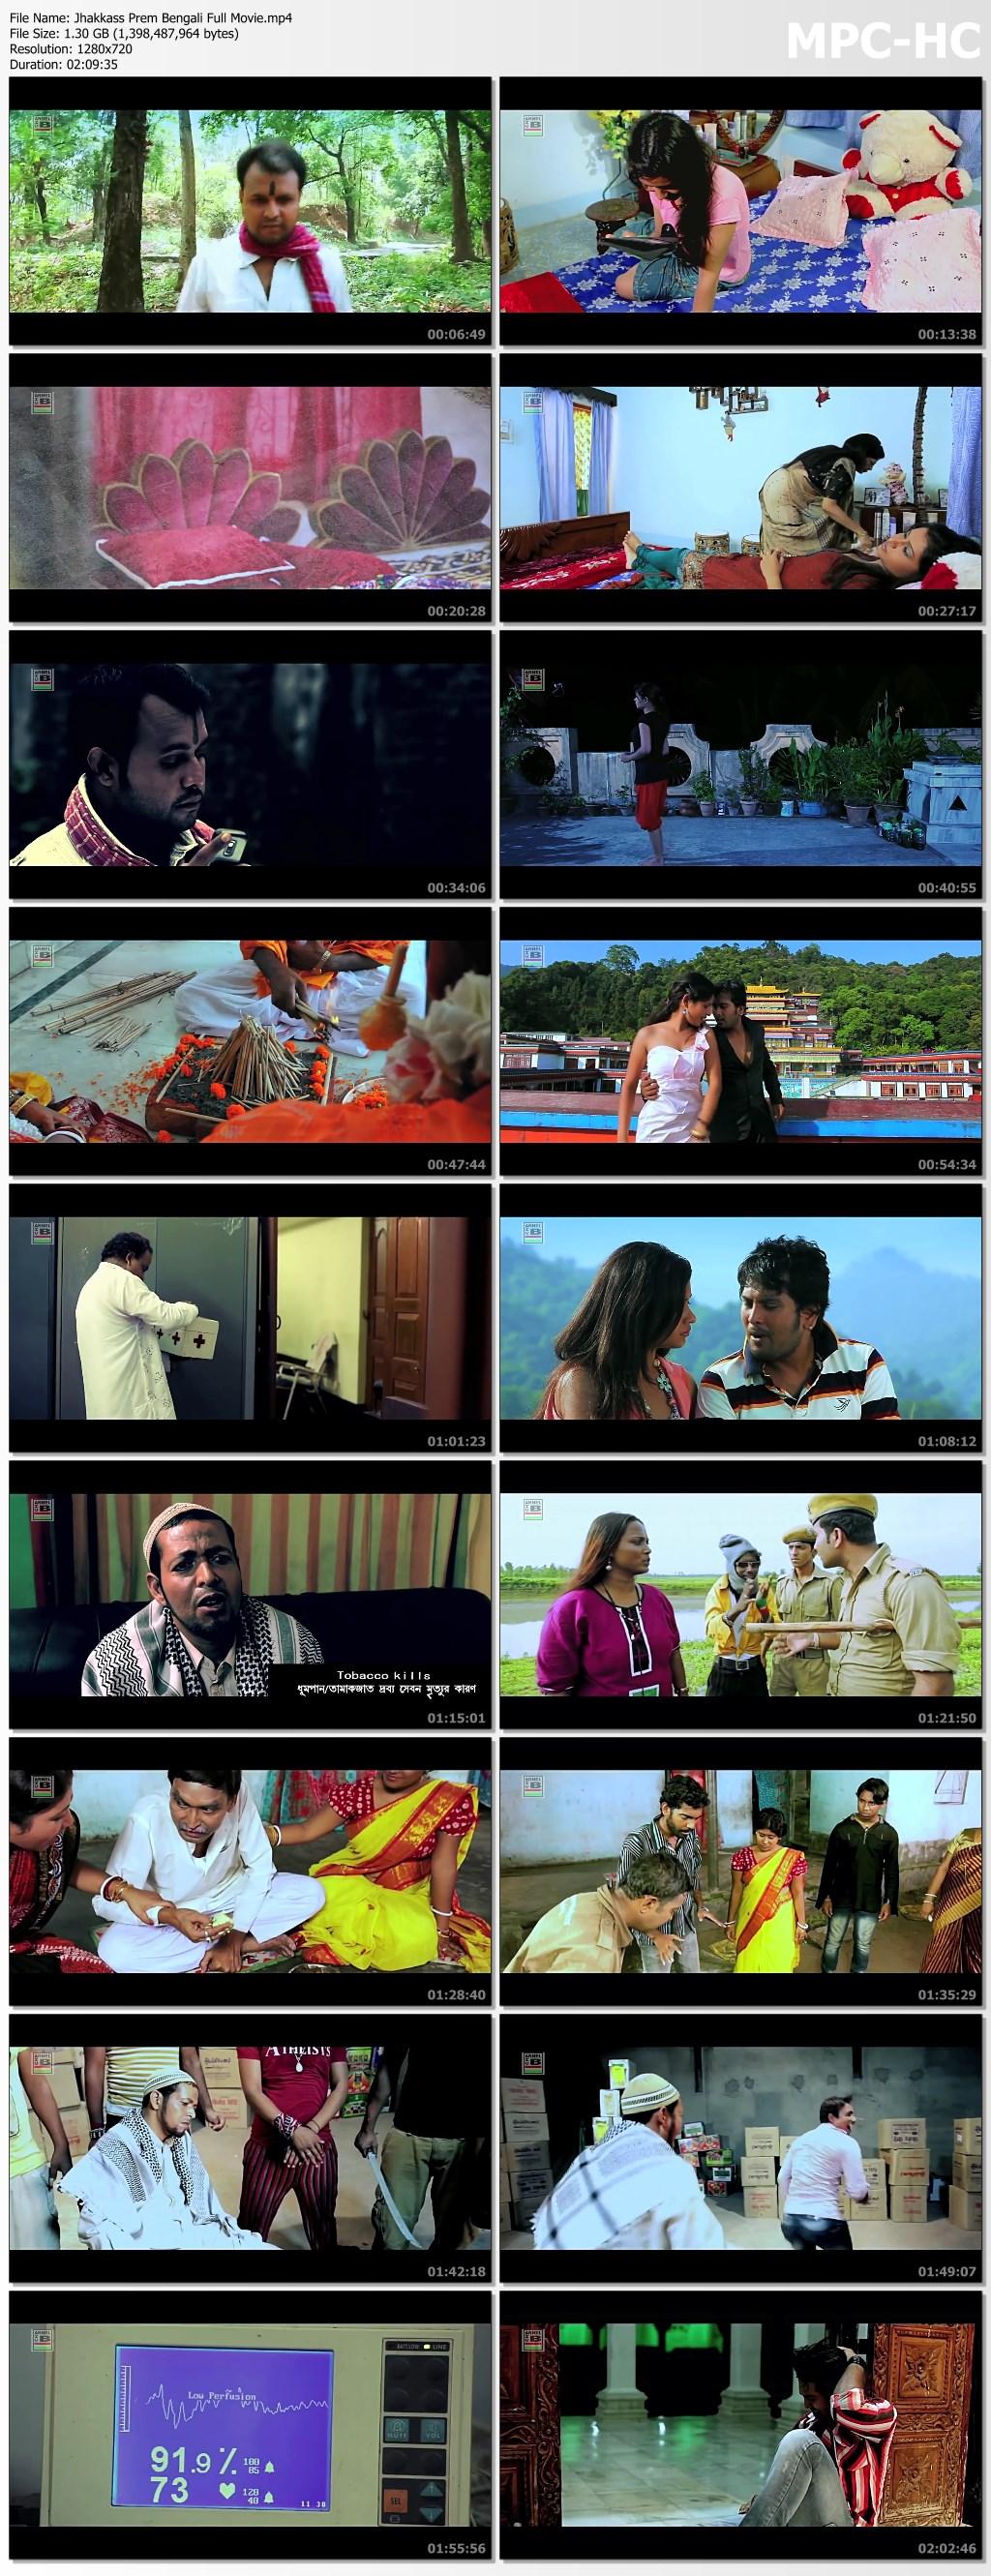 Jhakkass Prem Bengali Full Movie.mp4 thumbs